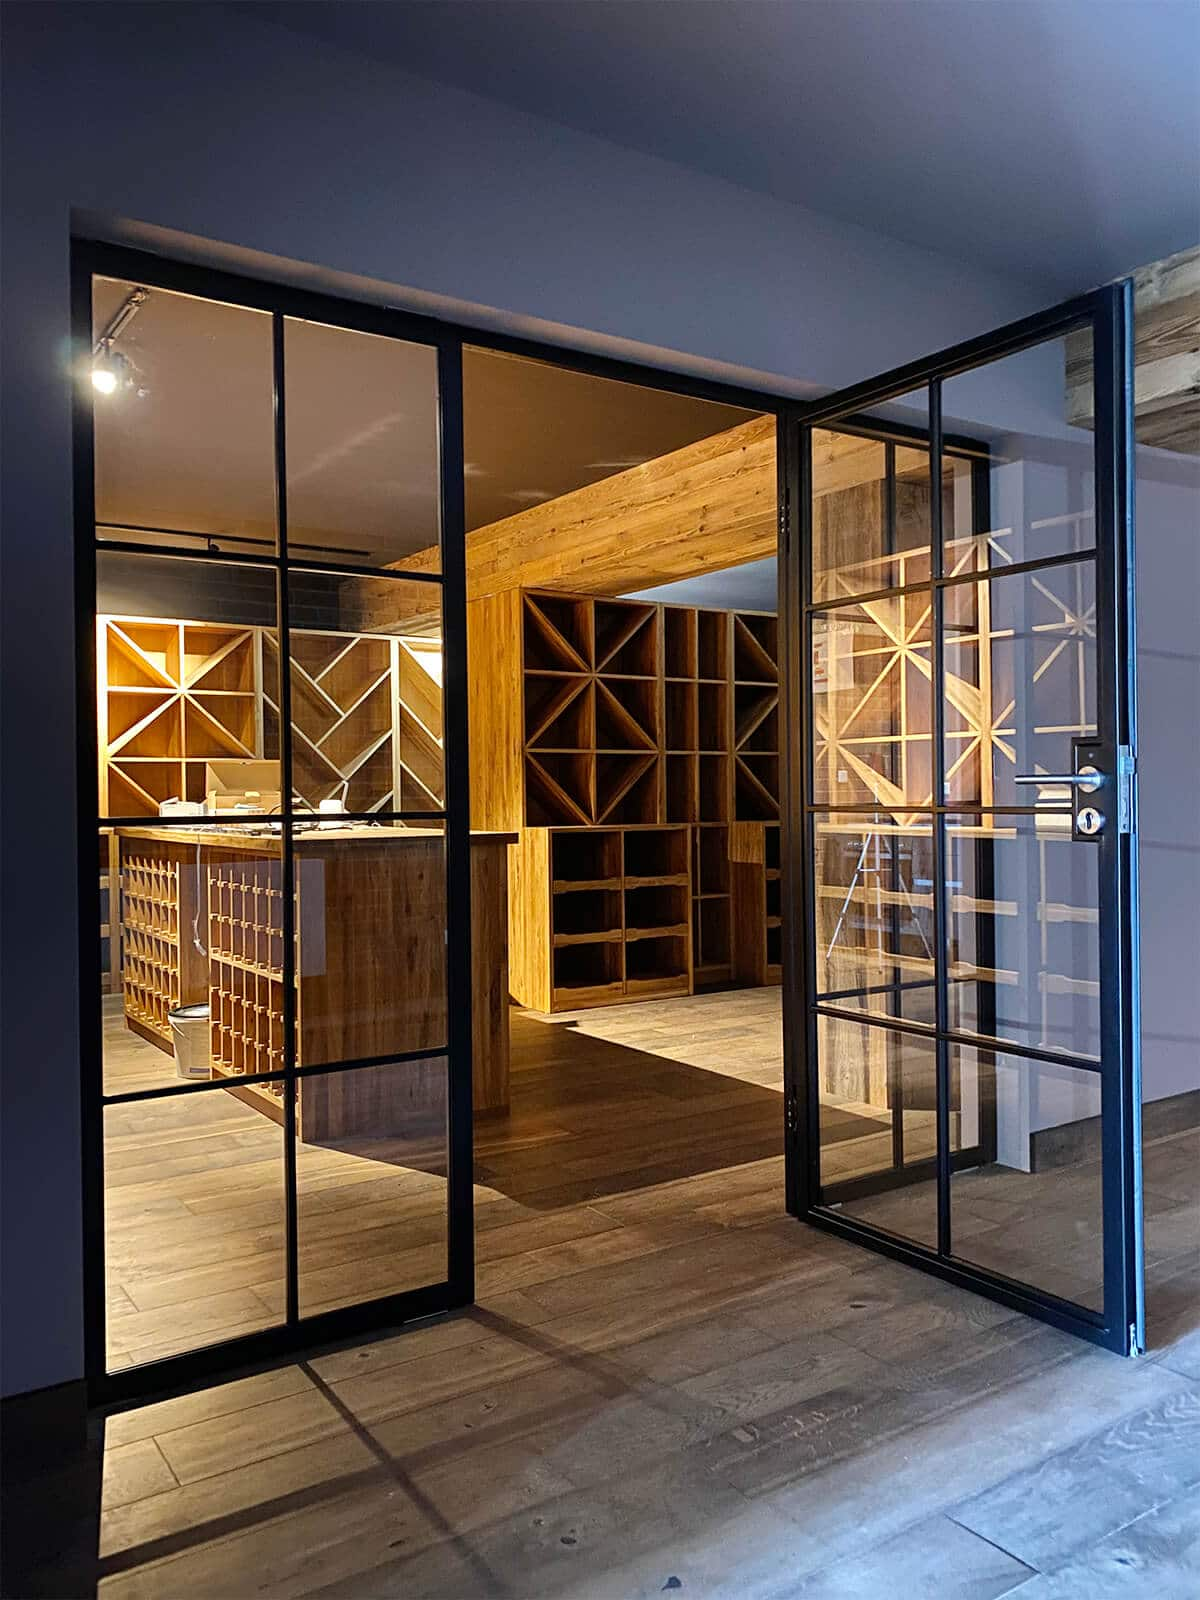 N51E12 Stahl Loft Tür, Glastrennwand, Windfang, Lofttür, Raumtrenner, Stahltür, Glastür, Bauhaustür, Bauhaus, Loft, Design, Design-Loft, Weinkeller, Einbau